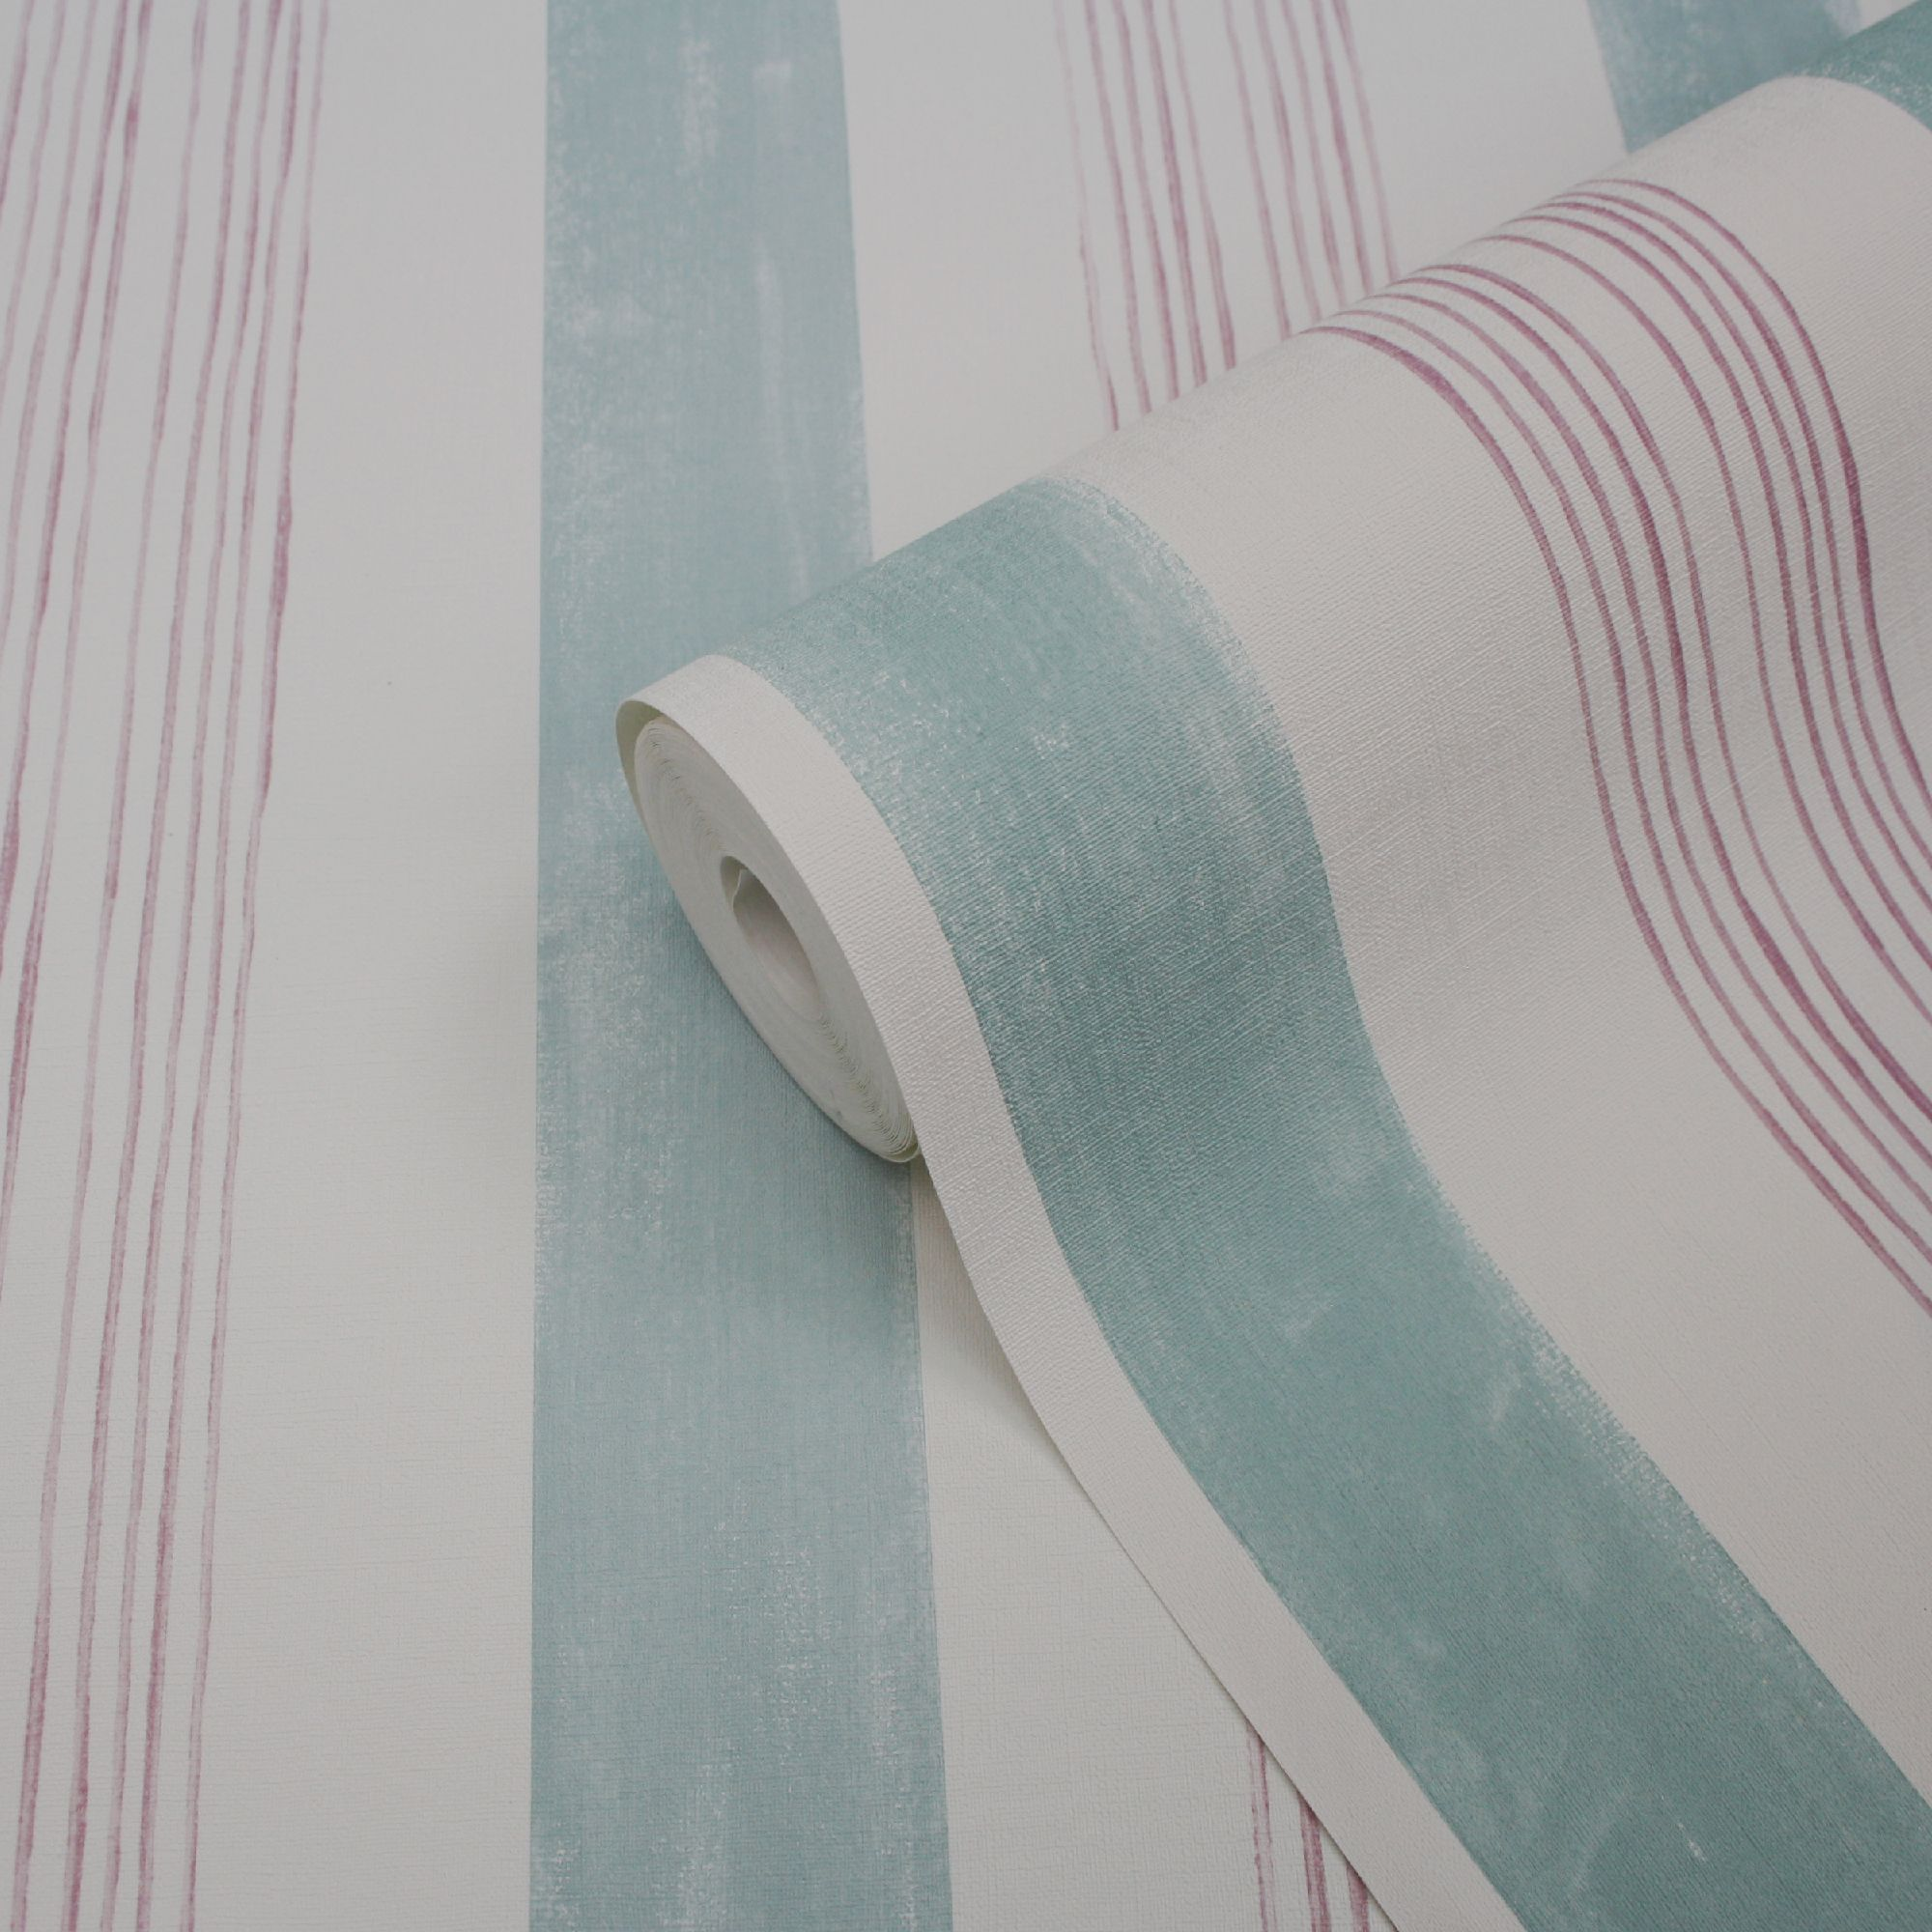 goodhome eulophia green pink striped textured wallpaper departments diy at b q goodhome eulophia green pink striped textured wallpaper departments diy at b q